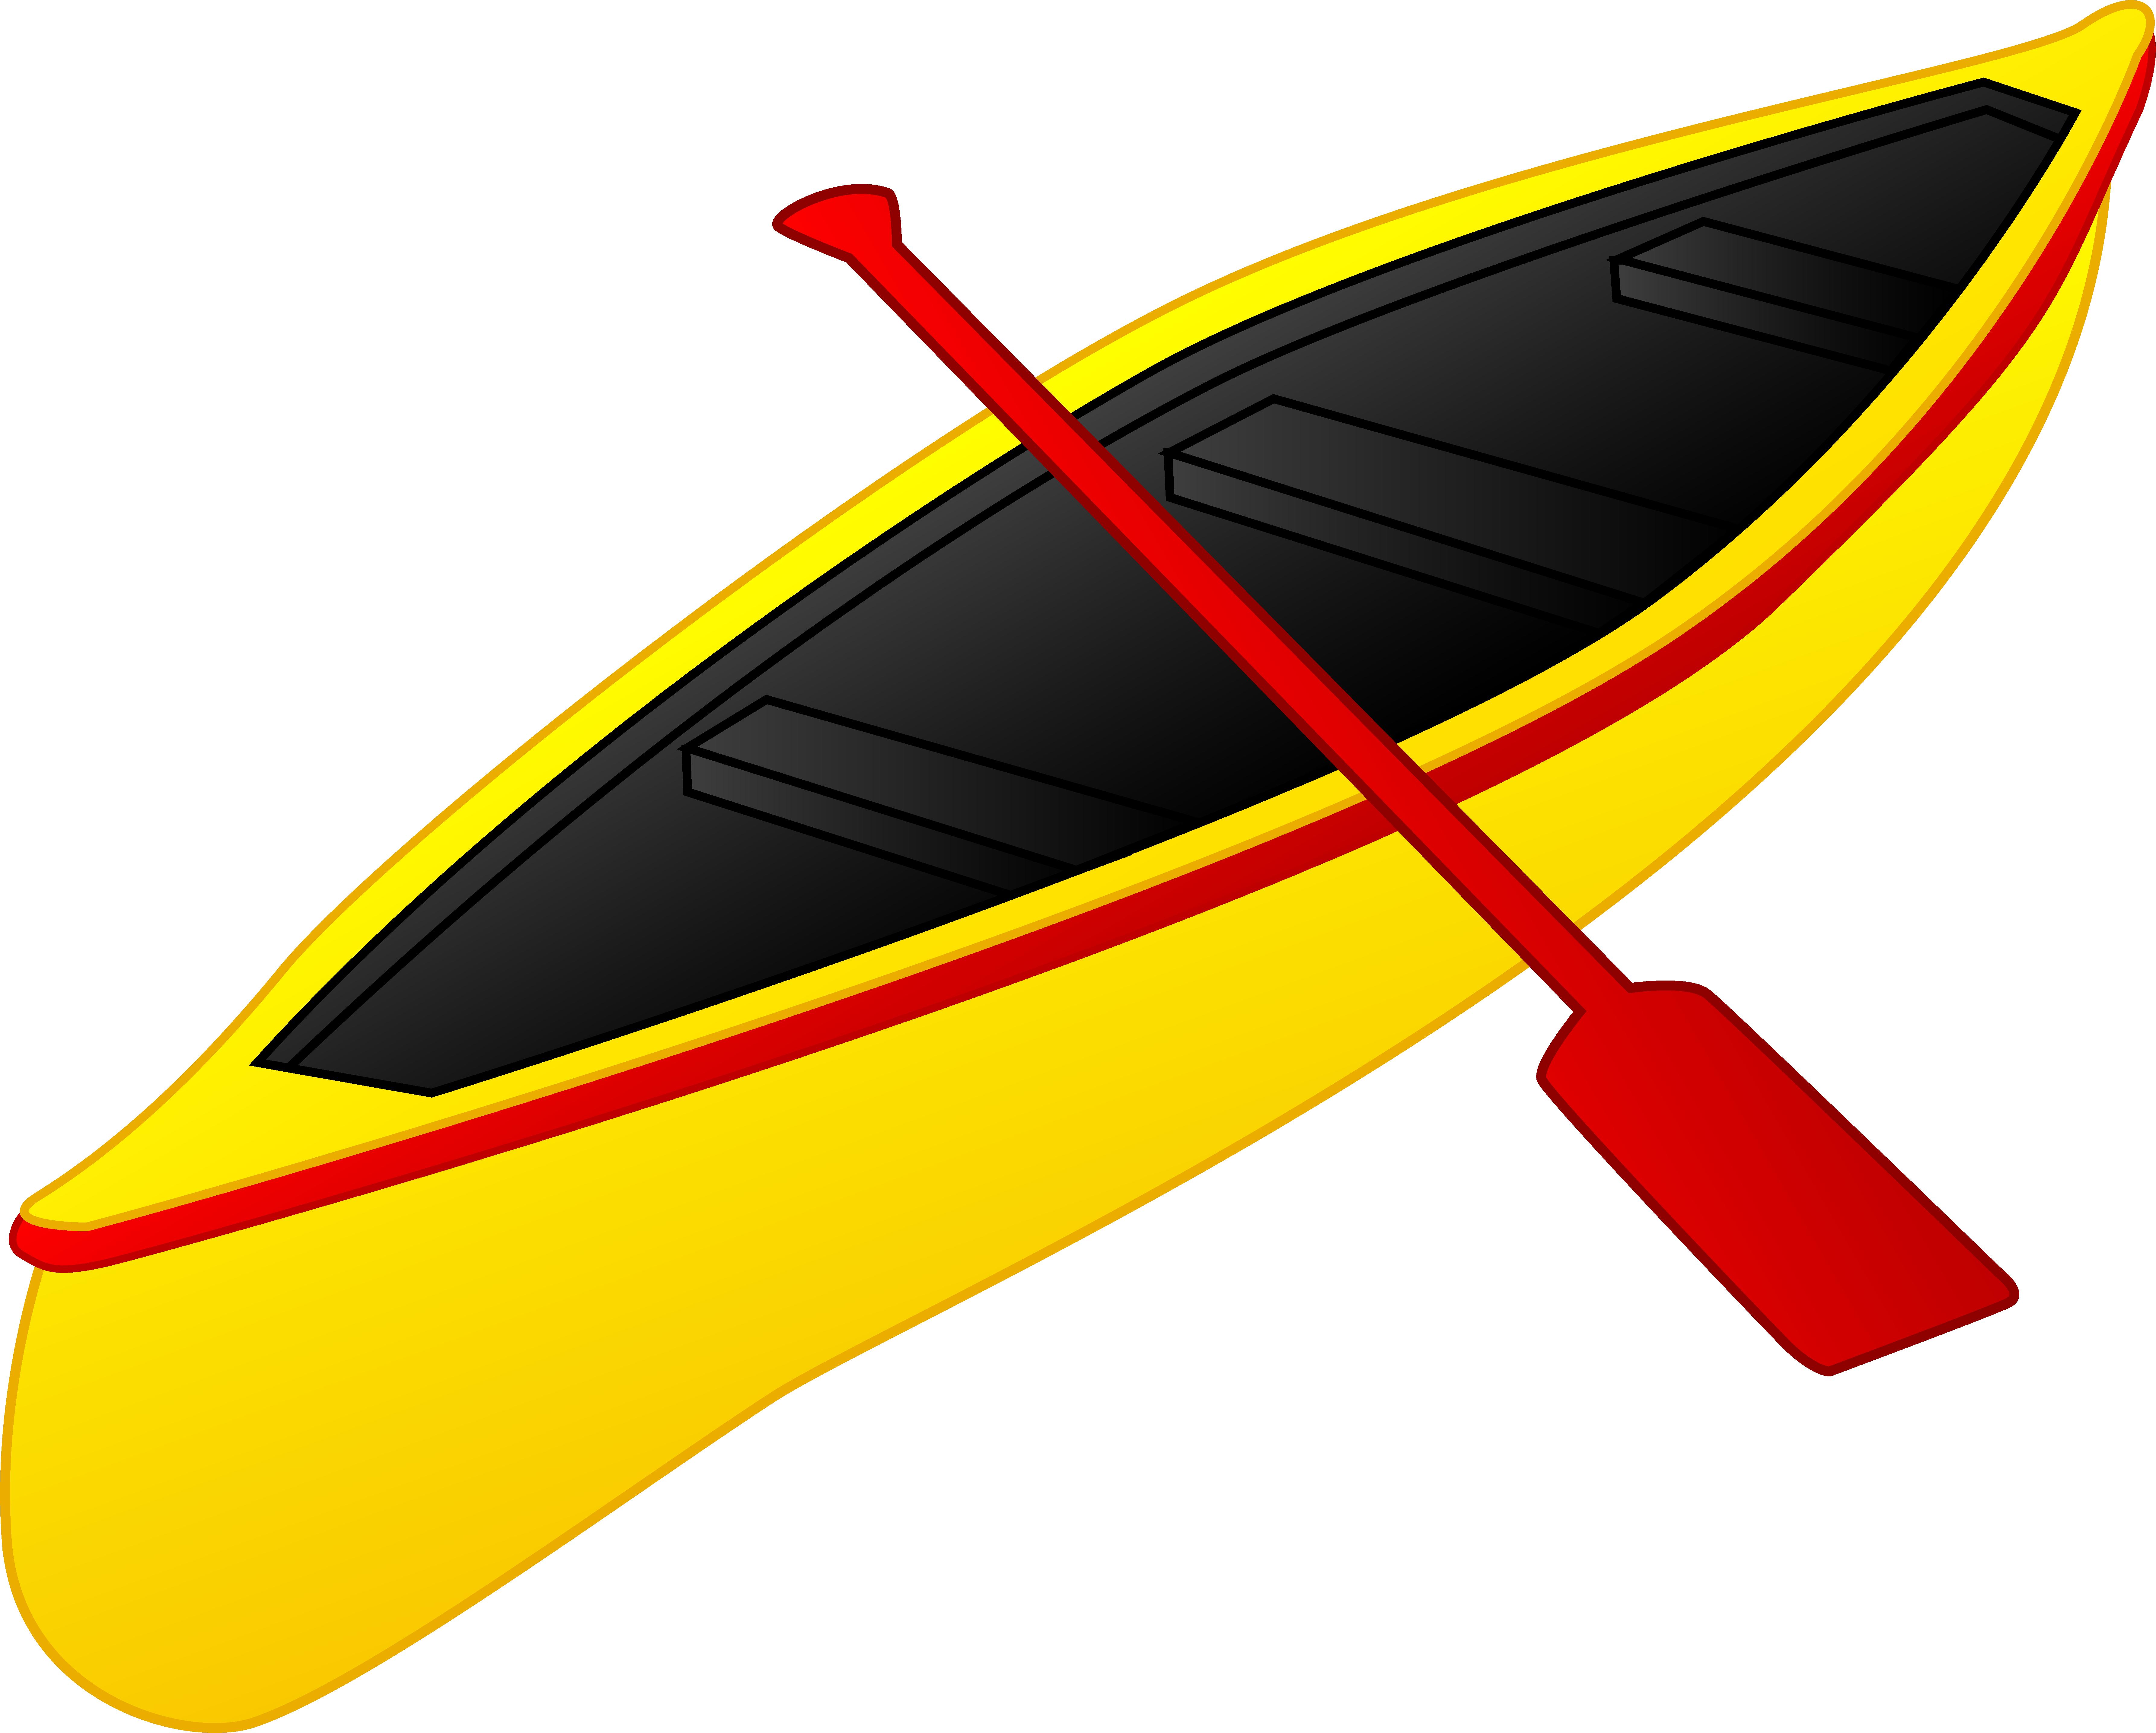 Clipart canoe kayak clip library Free Kayak Cliparts, Download Free Clip Art, Free Clip Art on ... clip library